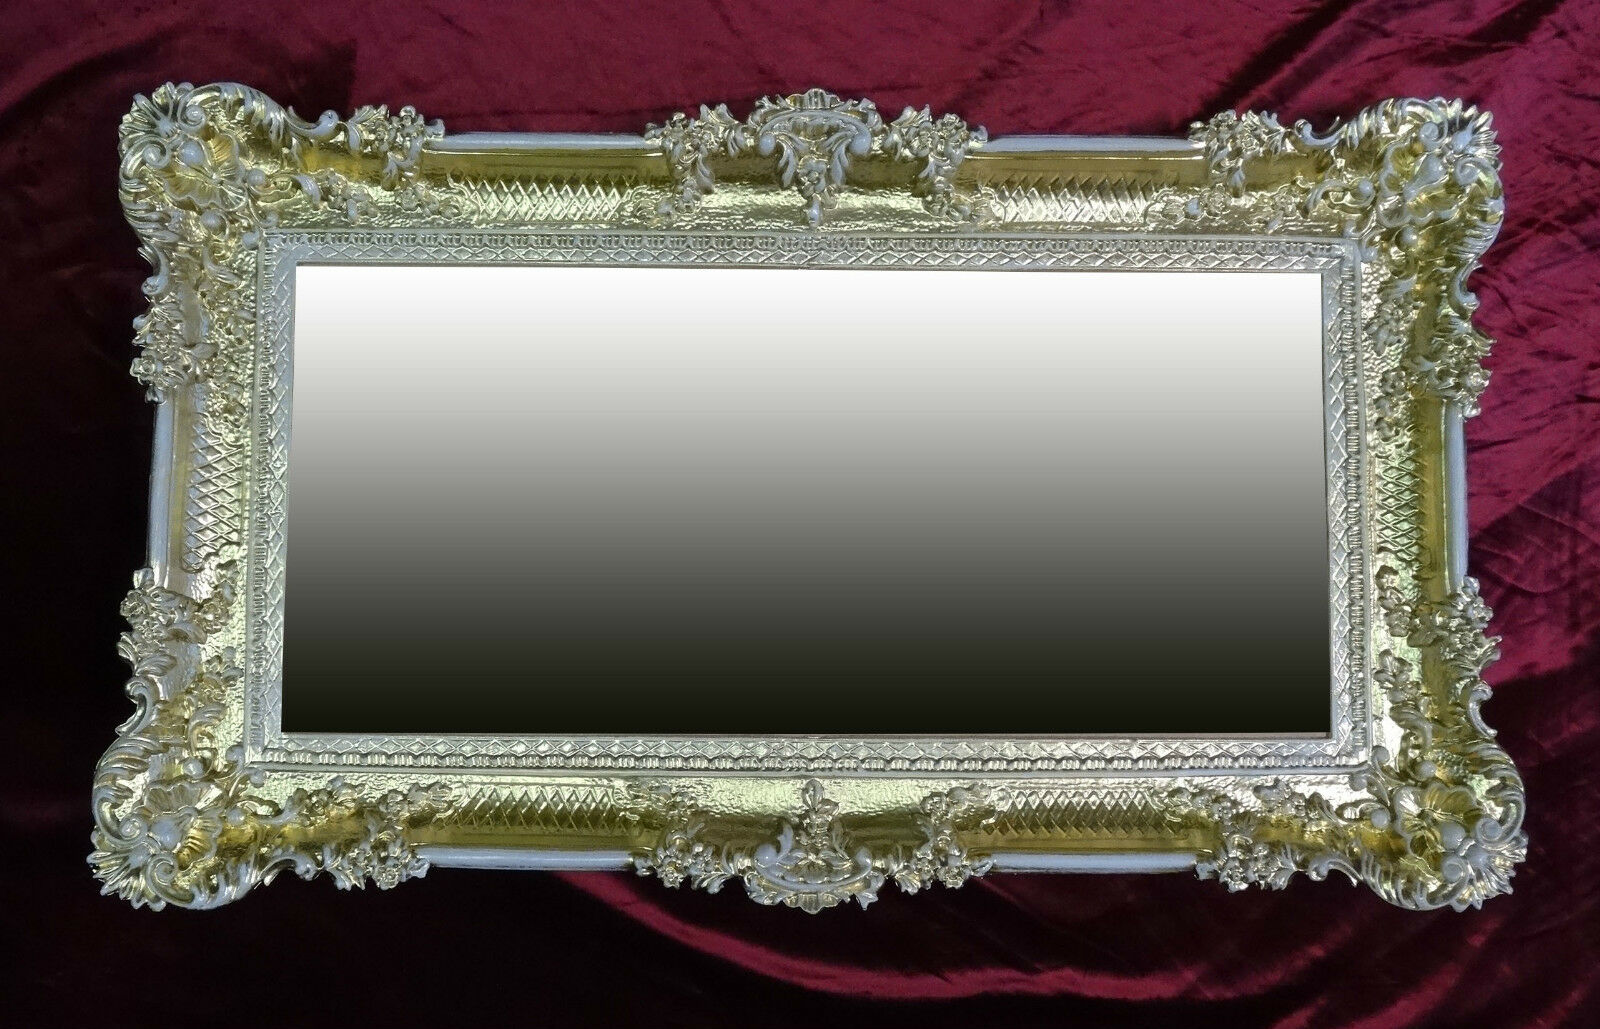 XXL Miroir mural rectangulaire Or Blanc Baroque décoration ancien 96x57 WOW